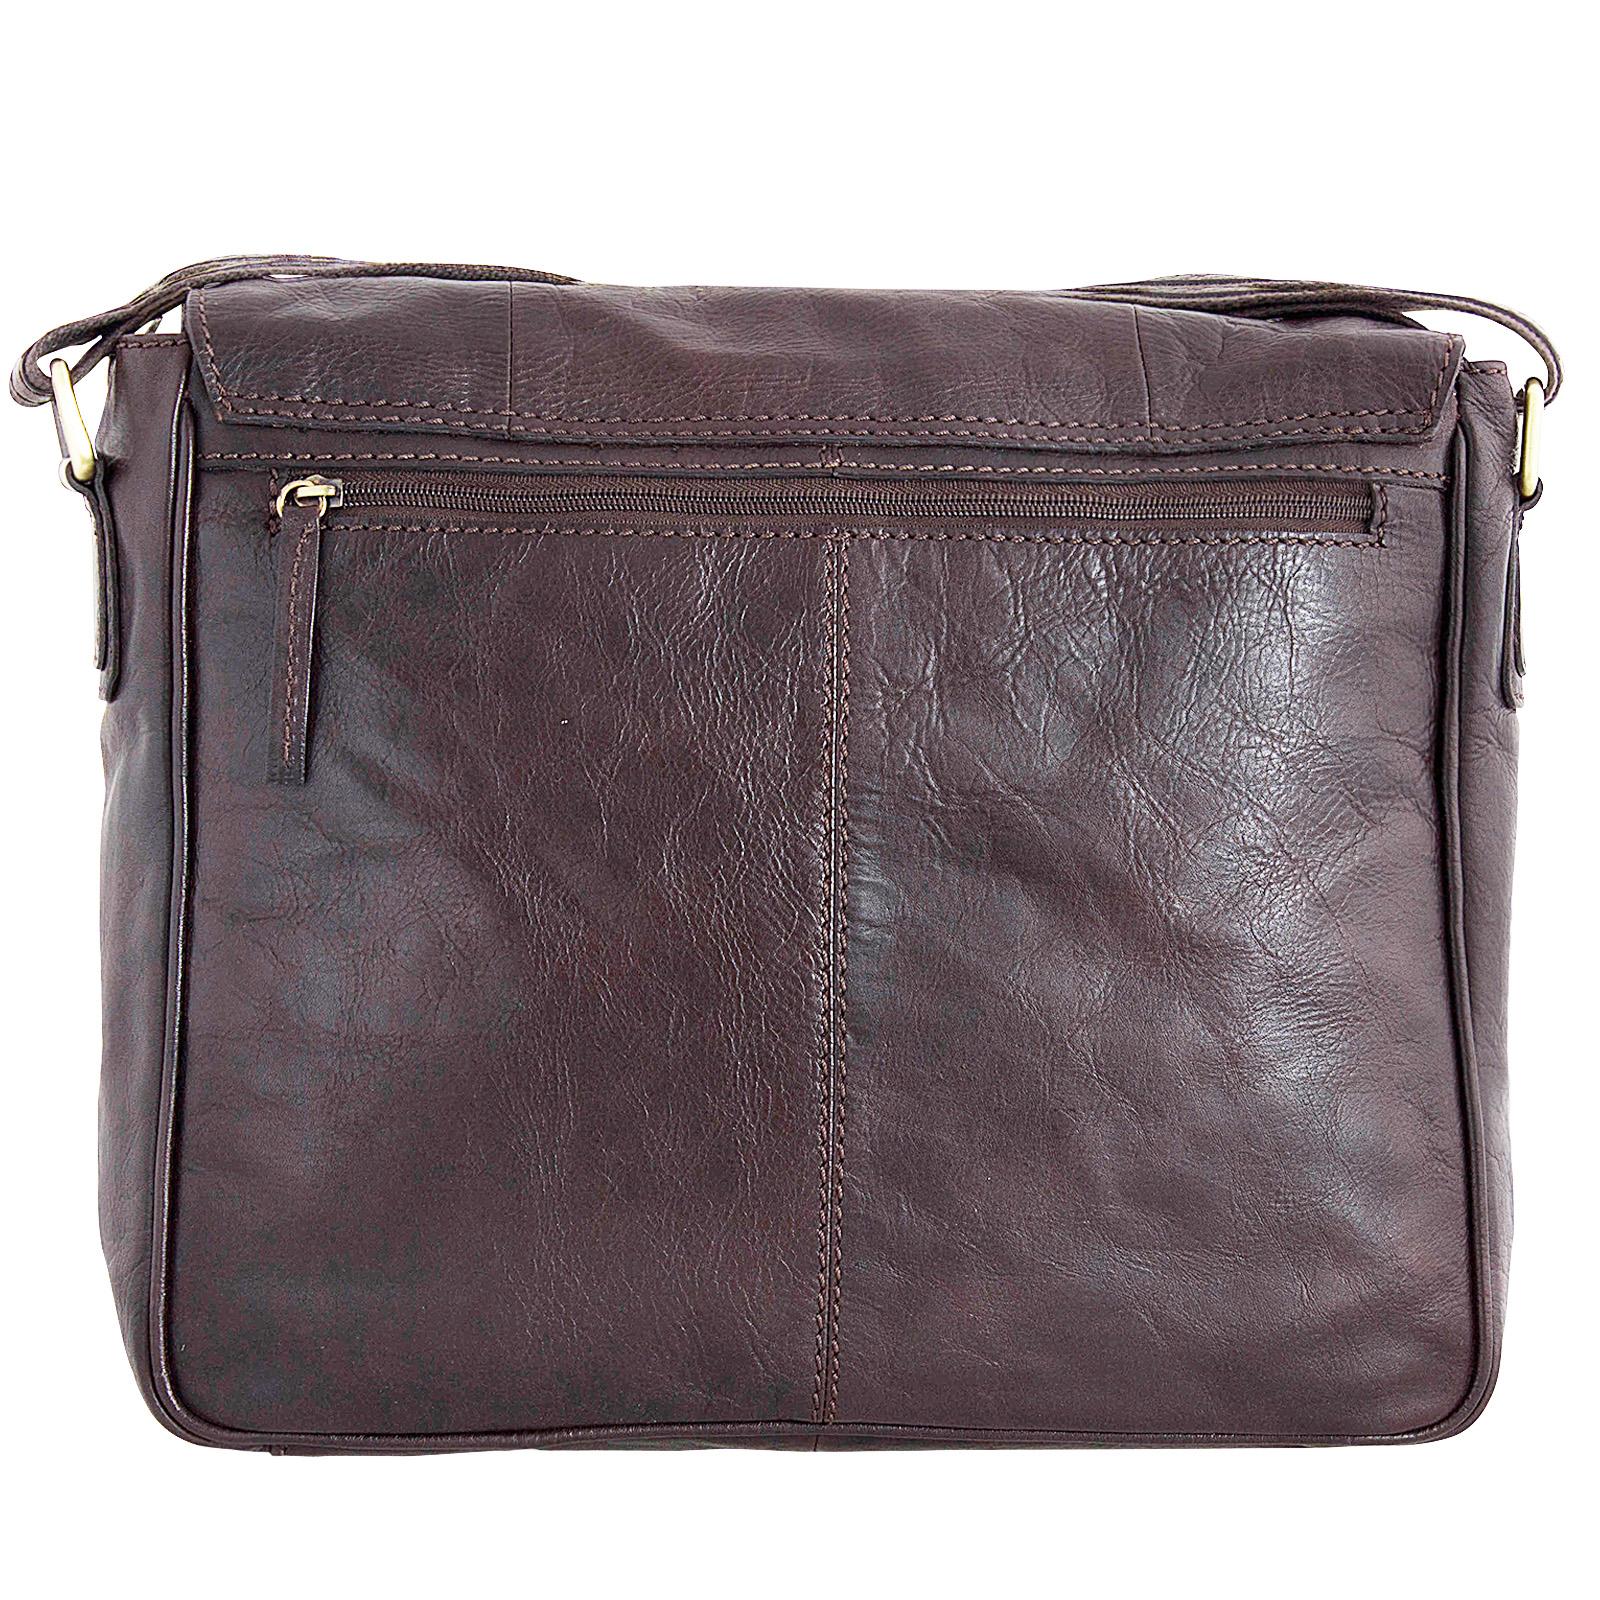 MacBook Tasche 13.3 Zoll Leder